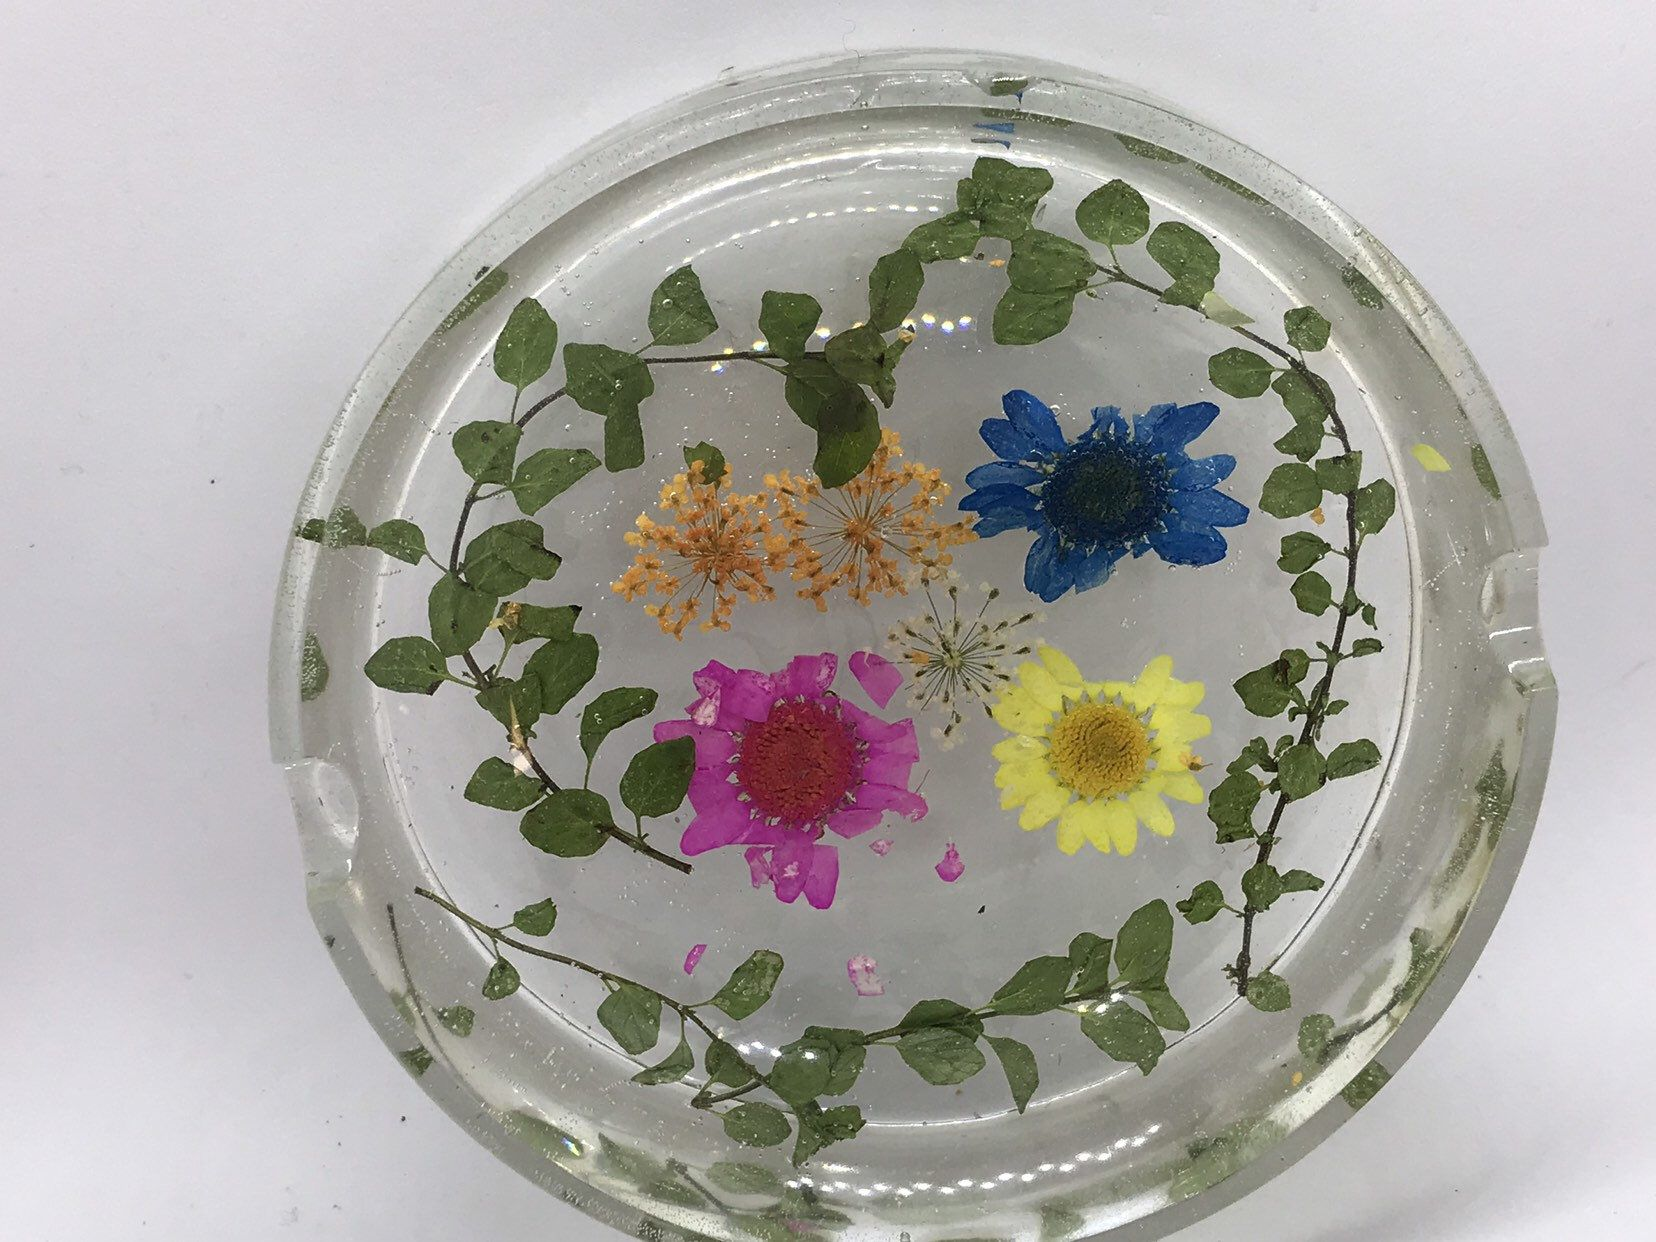 HAMSA HAND trinket ring soap dish jewelry jewellery tray fatima preserved pressed floral epoxy resin art boho decor botanical spiritual